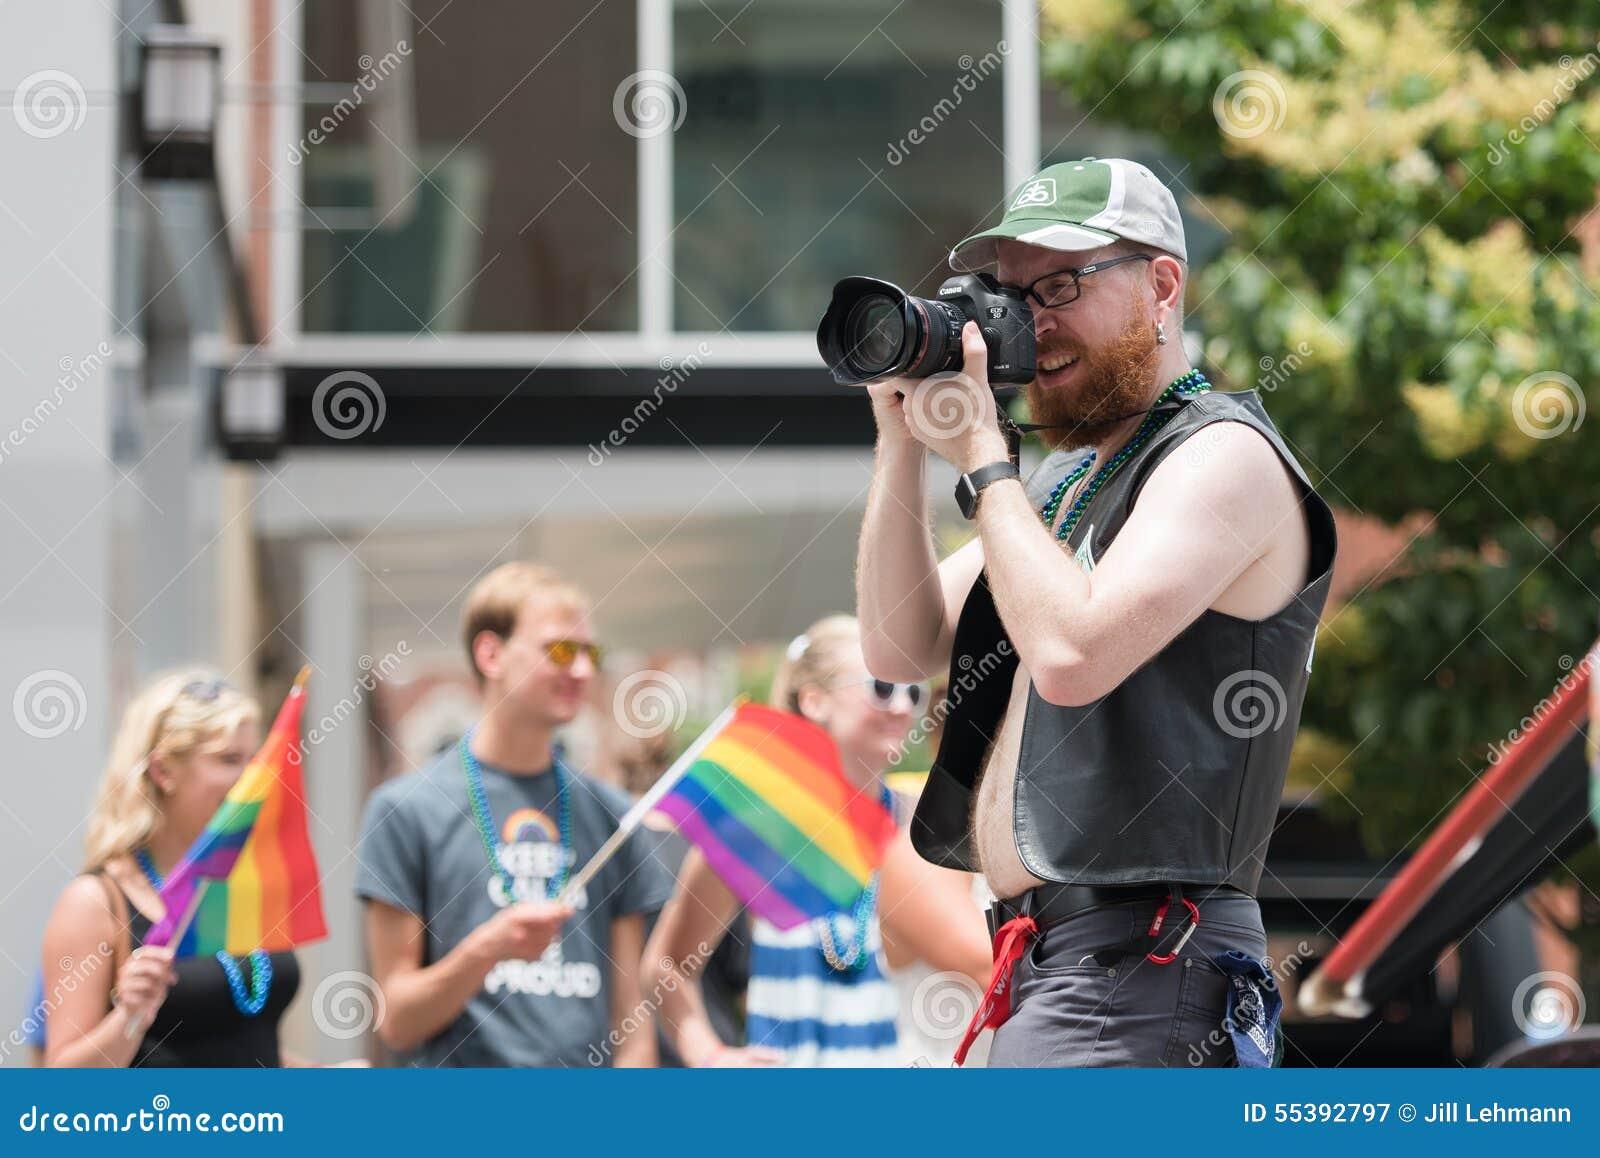 gay david tutera